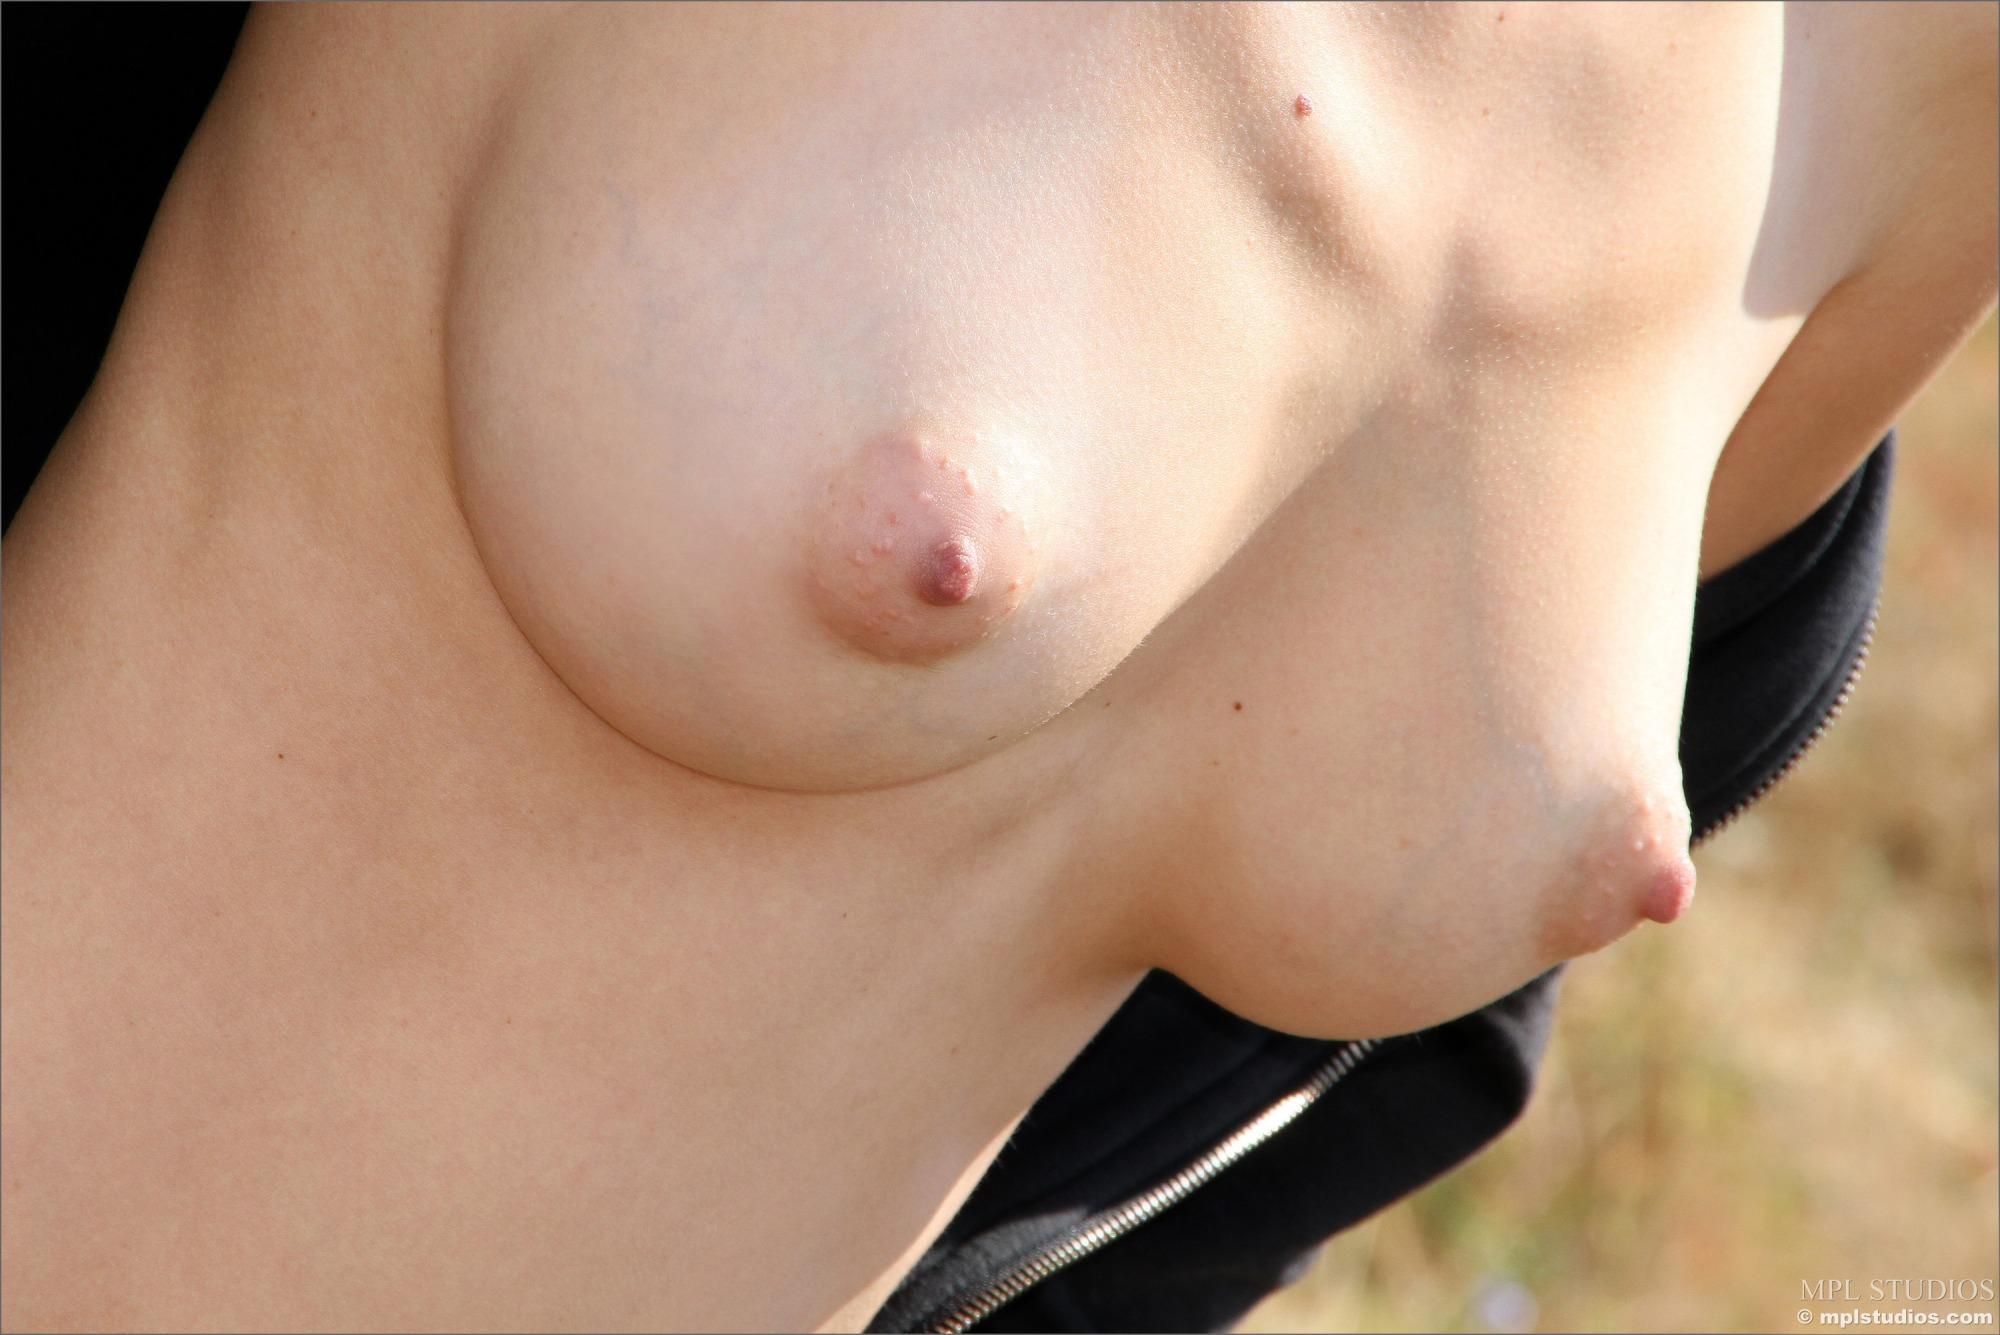 Стоячая грудь фото крупно 17 фотография